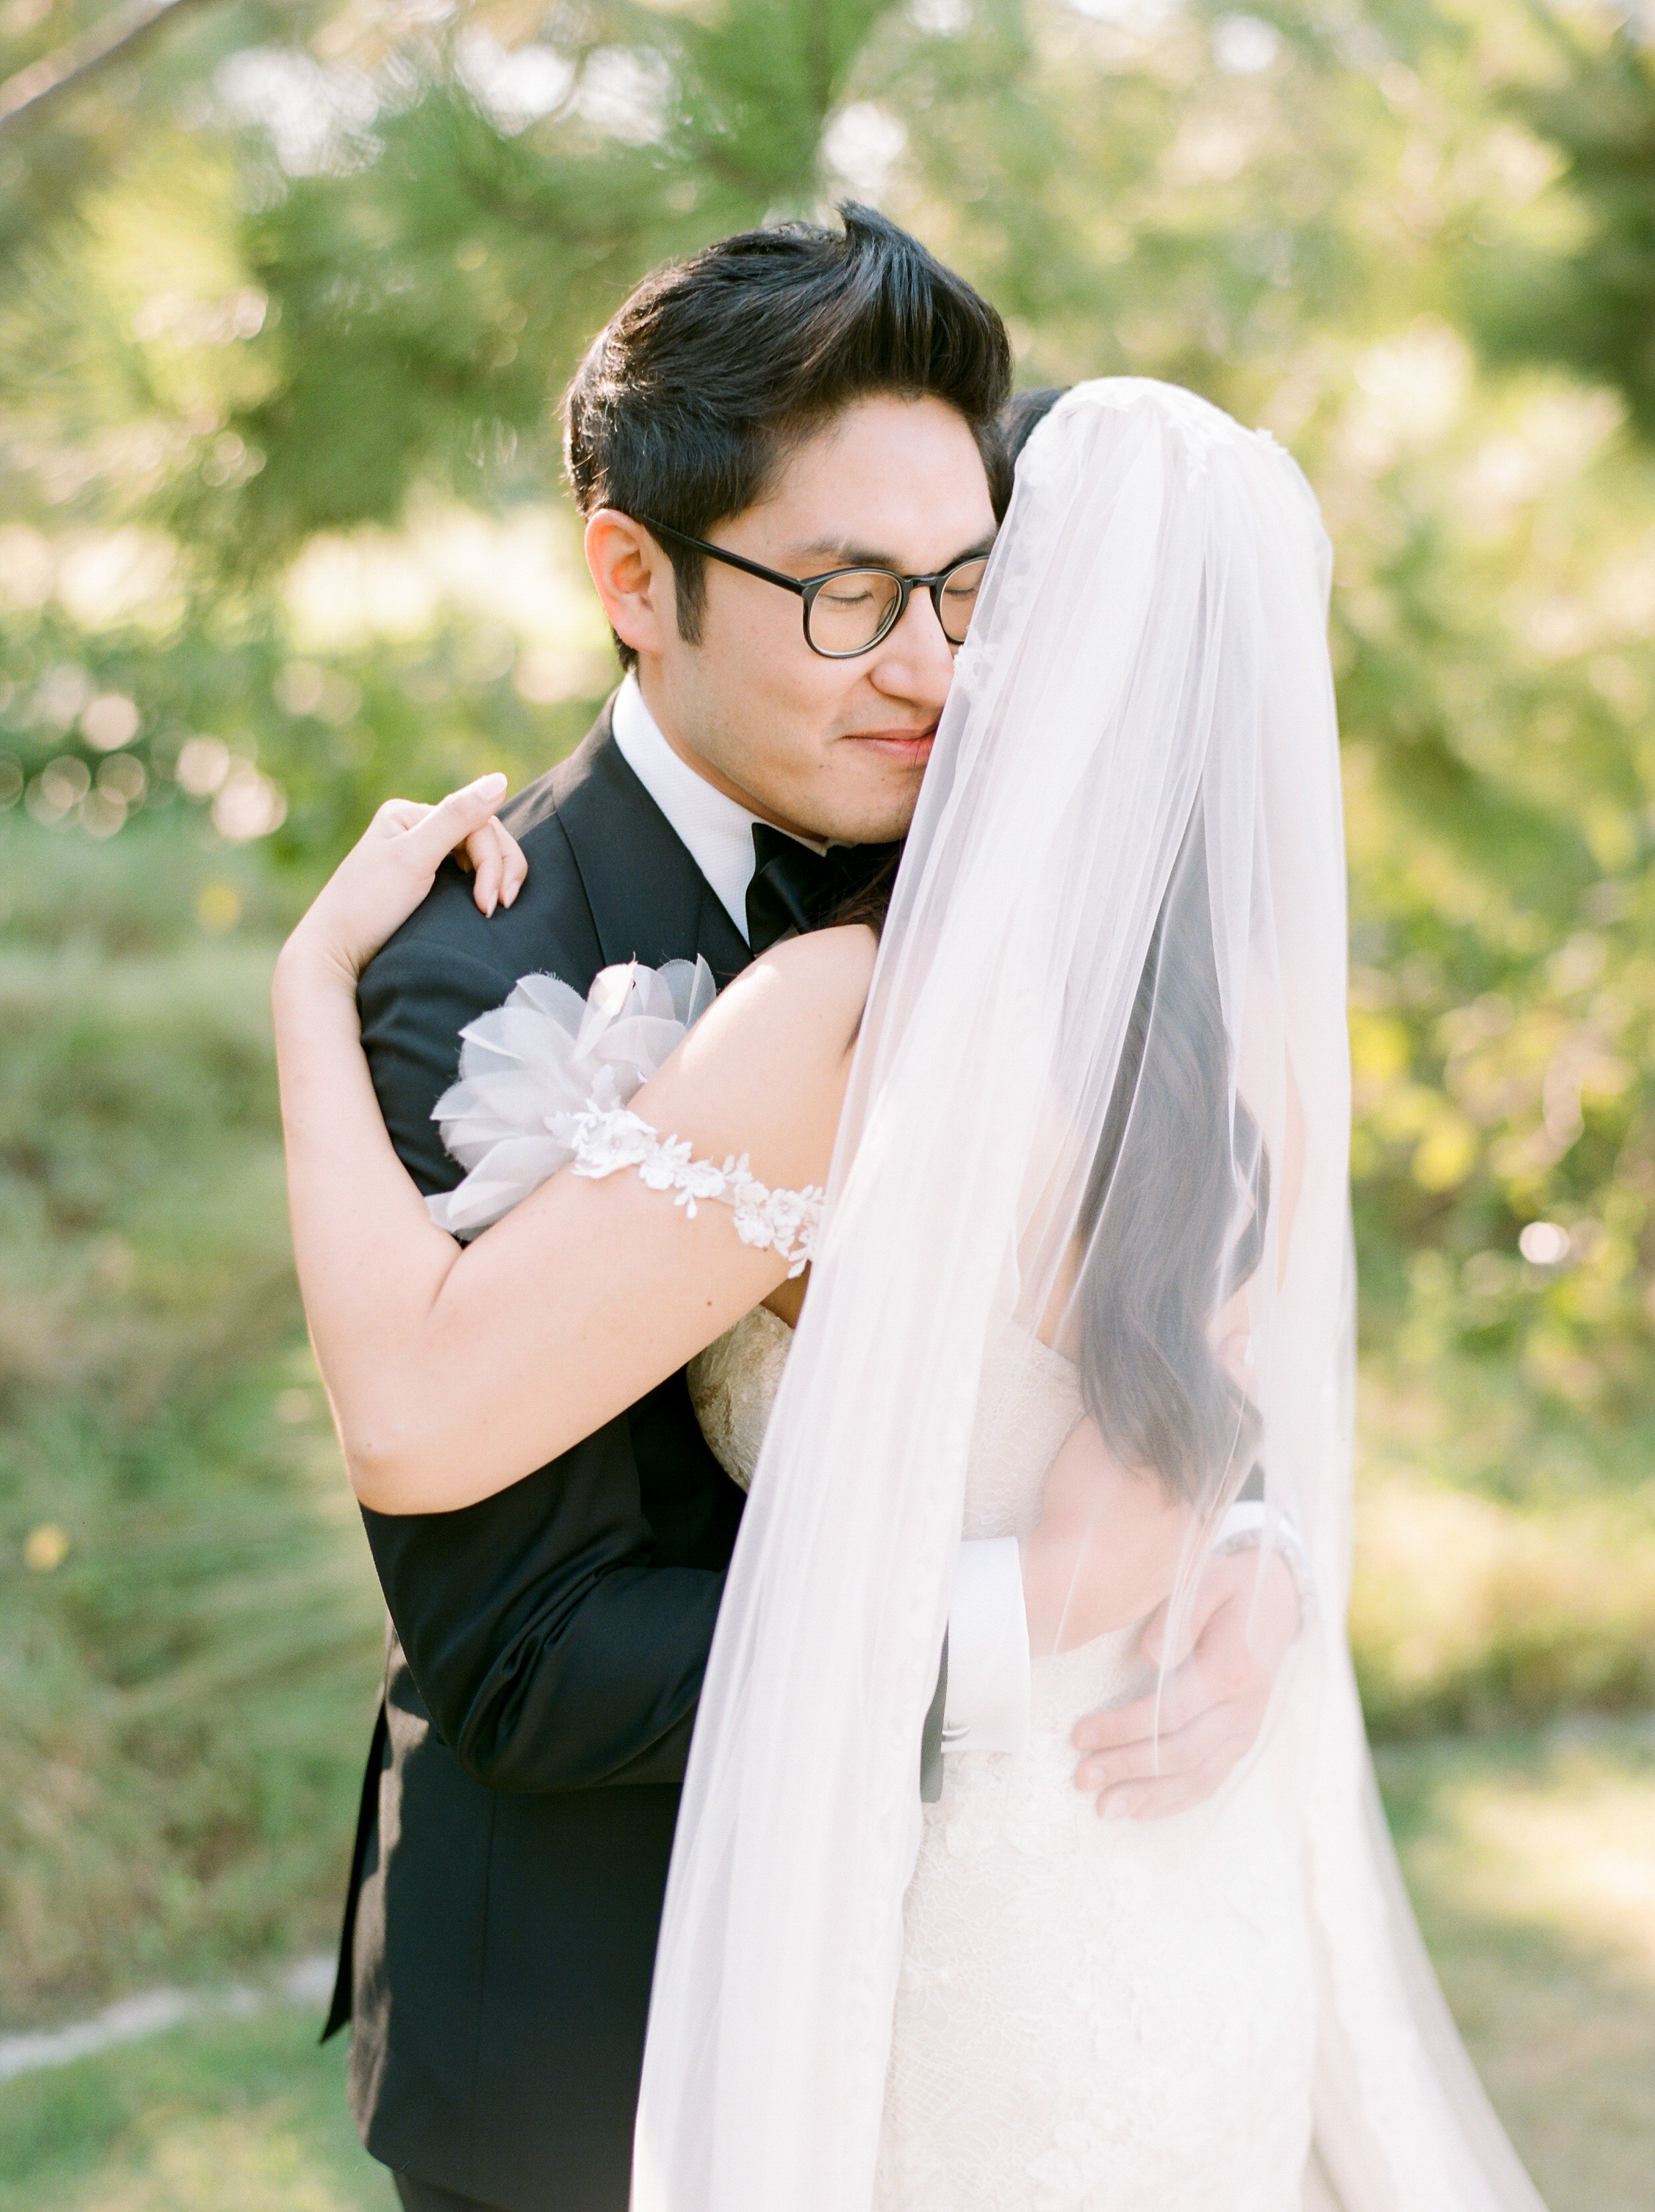 Martha-Stewart-Wedding-Dana-Fernandez-Photography-Josh-Texas-Film-Houston-Wedding-Fine-Art-Photographer-McGovern-Centennial-Gardens-Top-Best-162.jpg